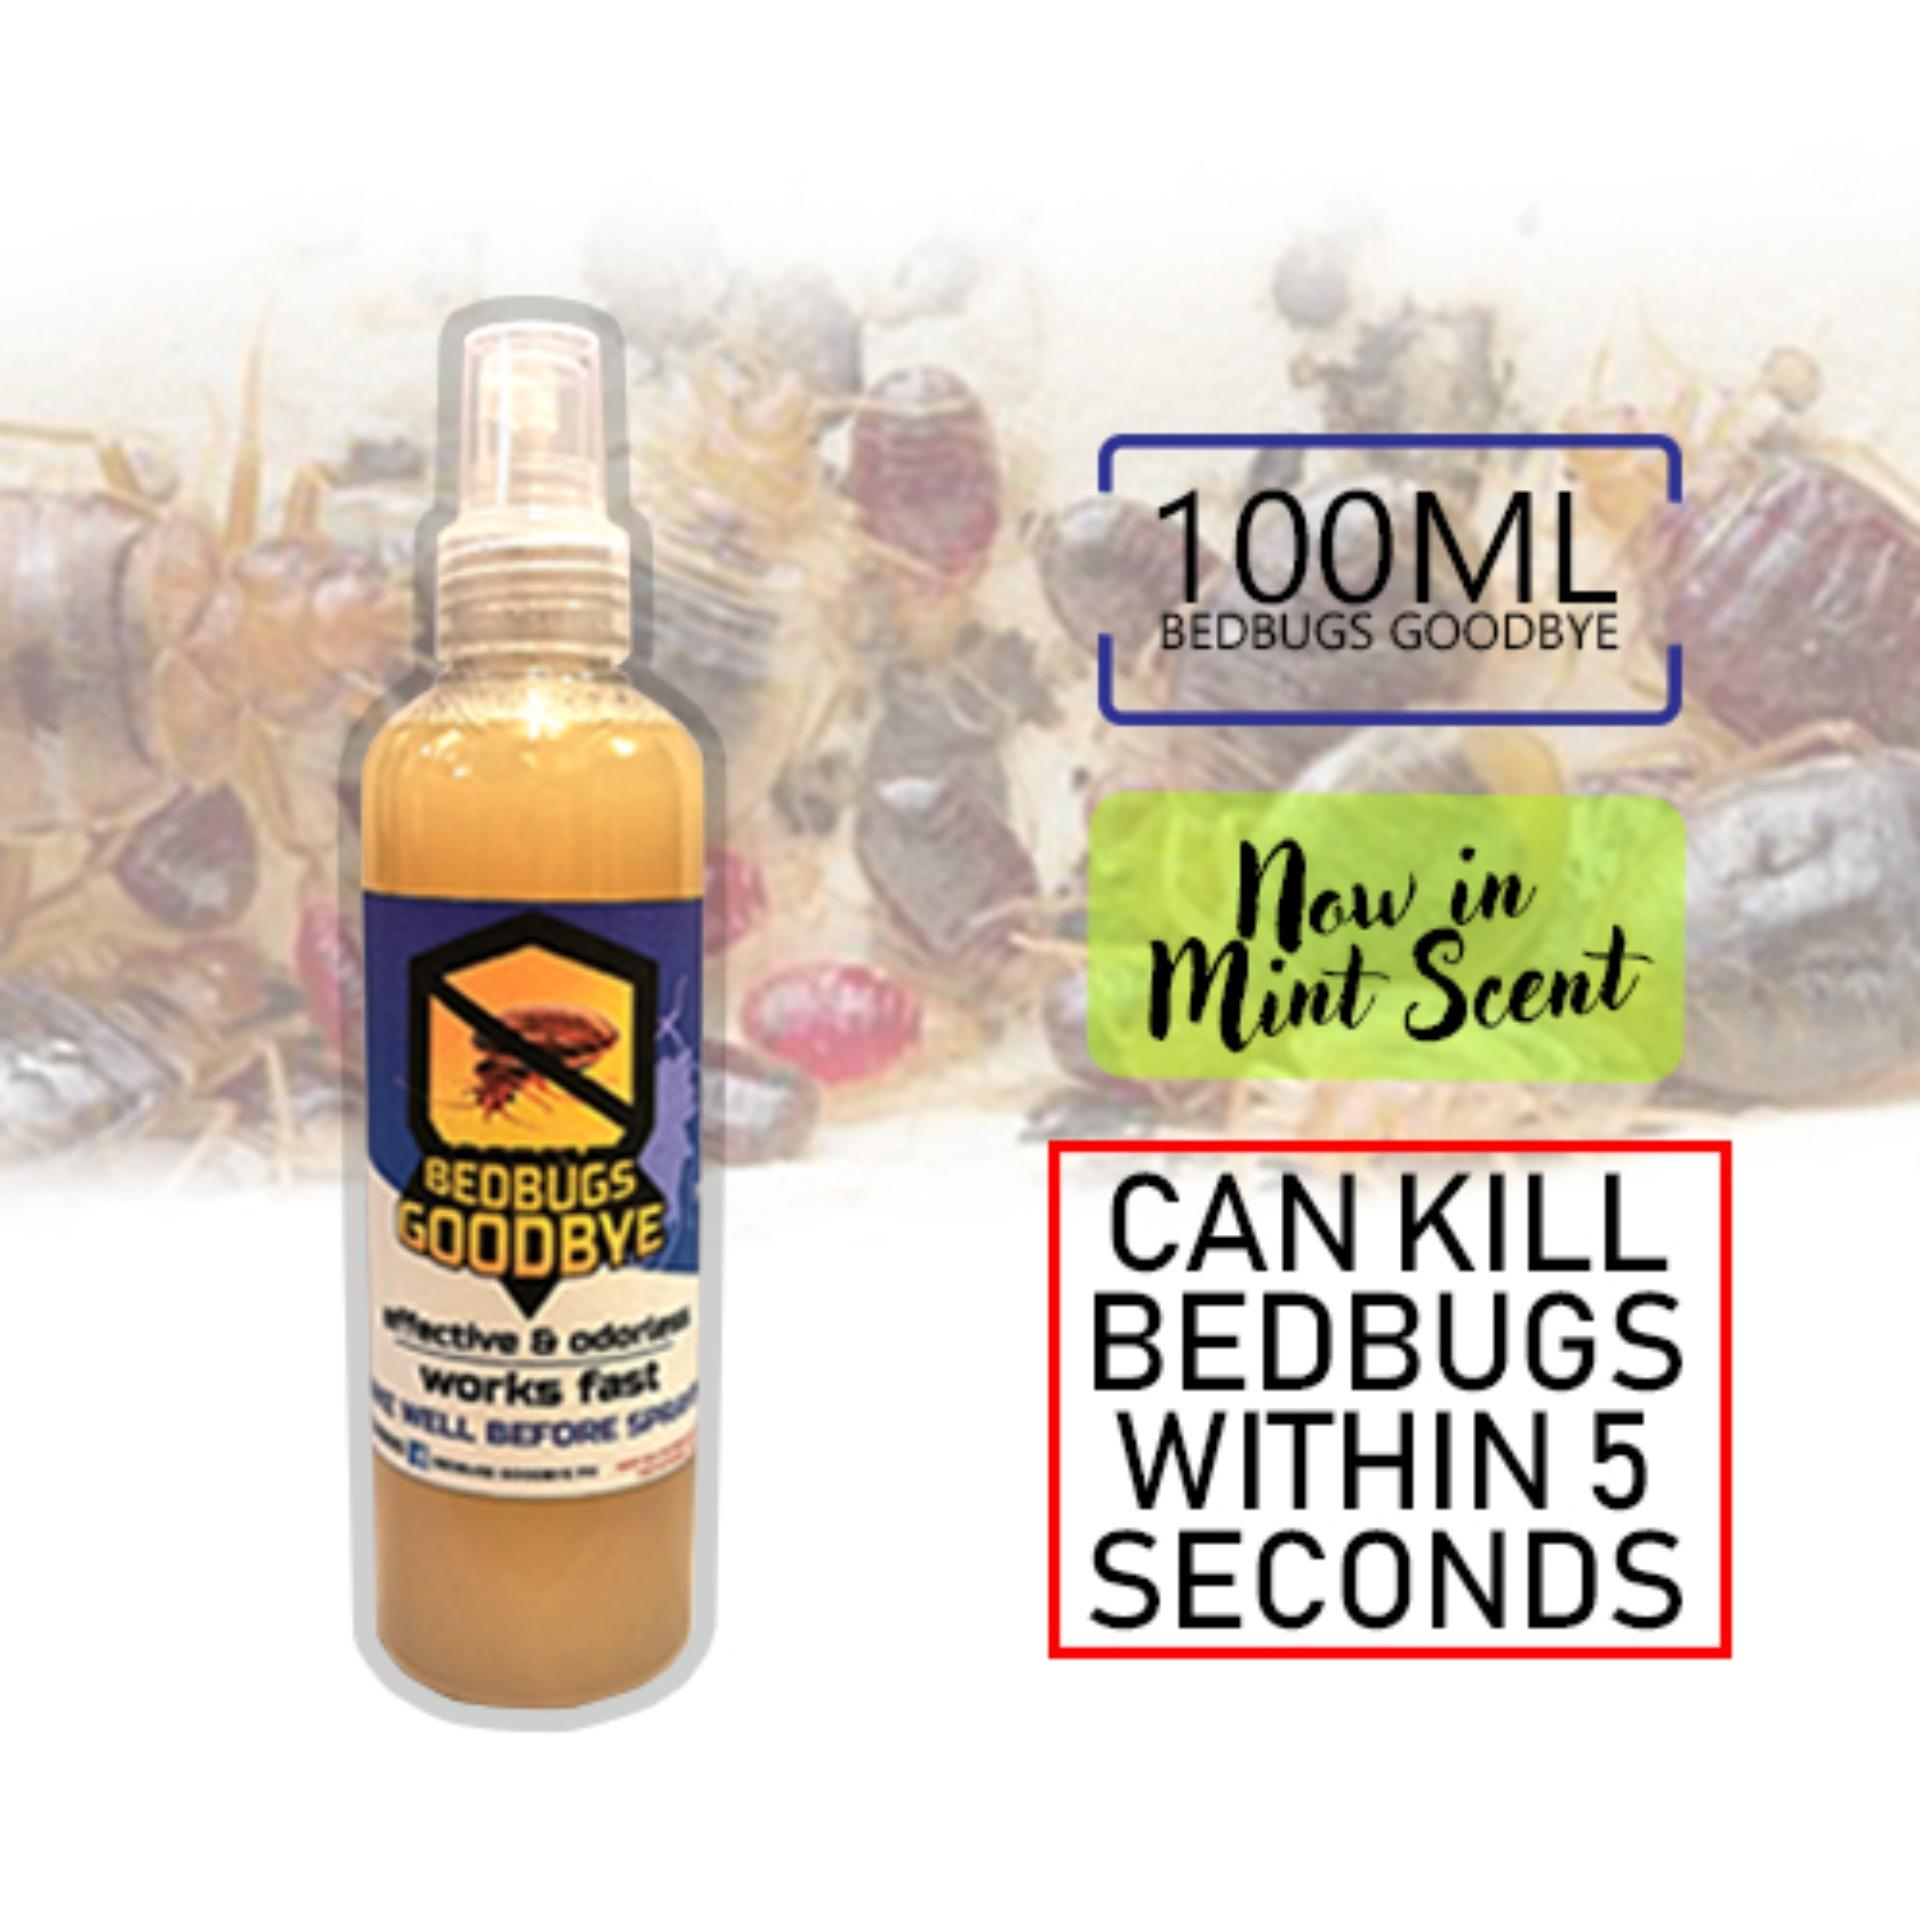 Bedbugs Goodbye Spray Natural Bed bugs Killer effective odorless 100ml